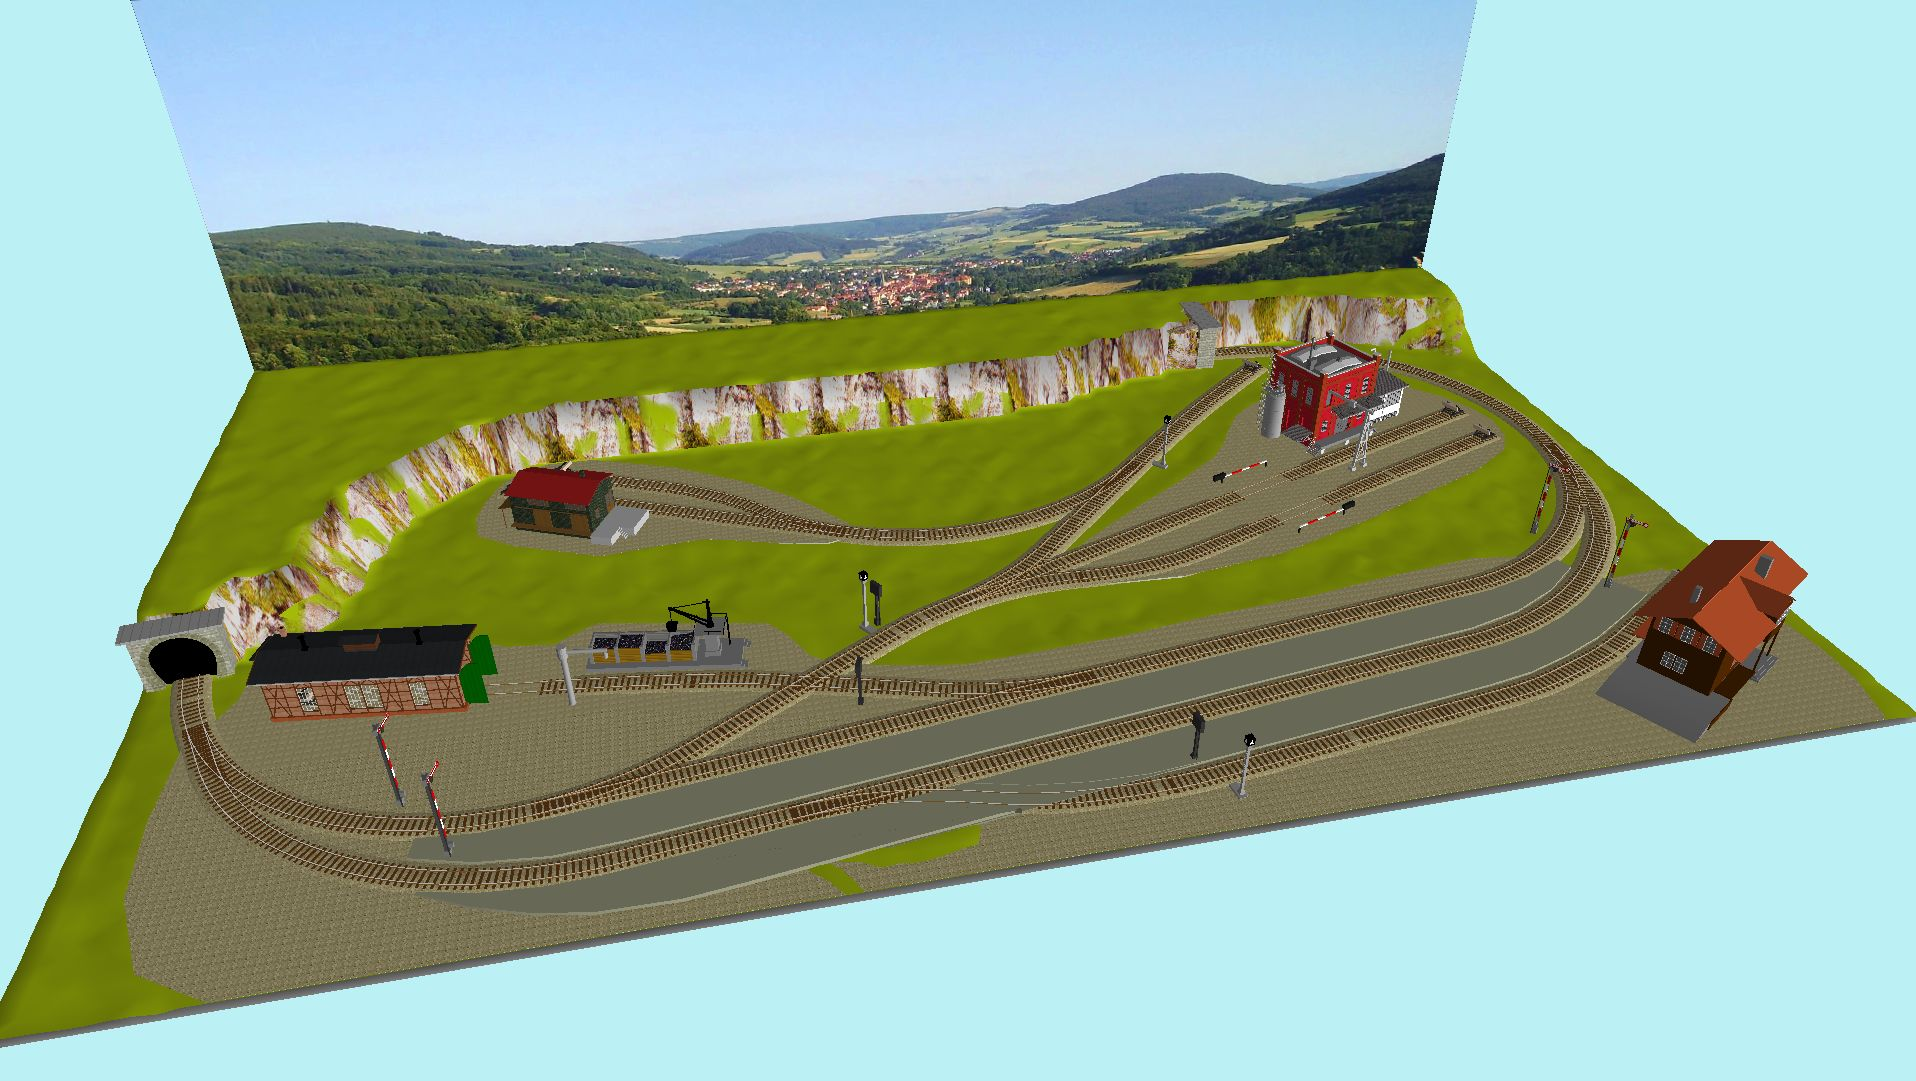 'ALBA Modellbahnpraxis' Band 1, Plan 5 Amp-1_5_m-gleis_2pekwx